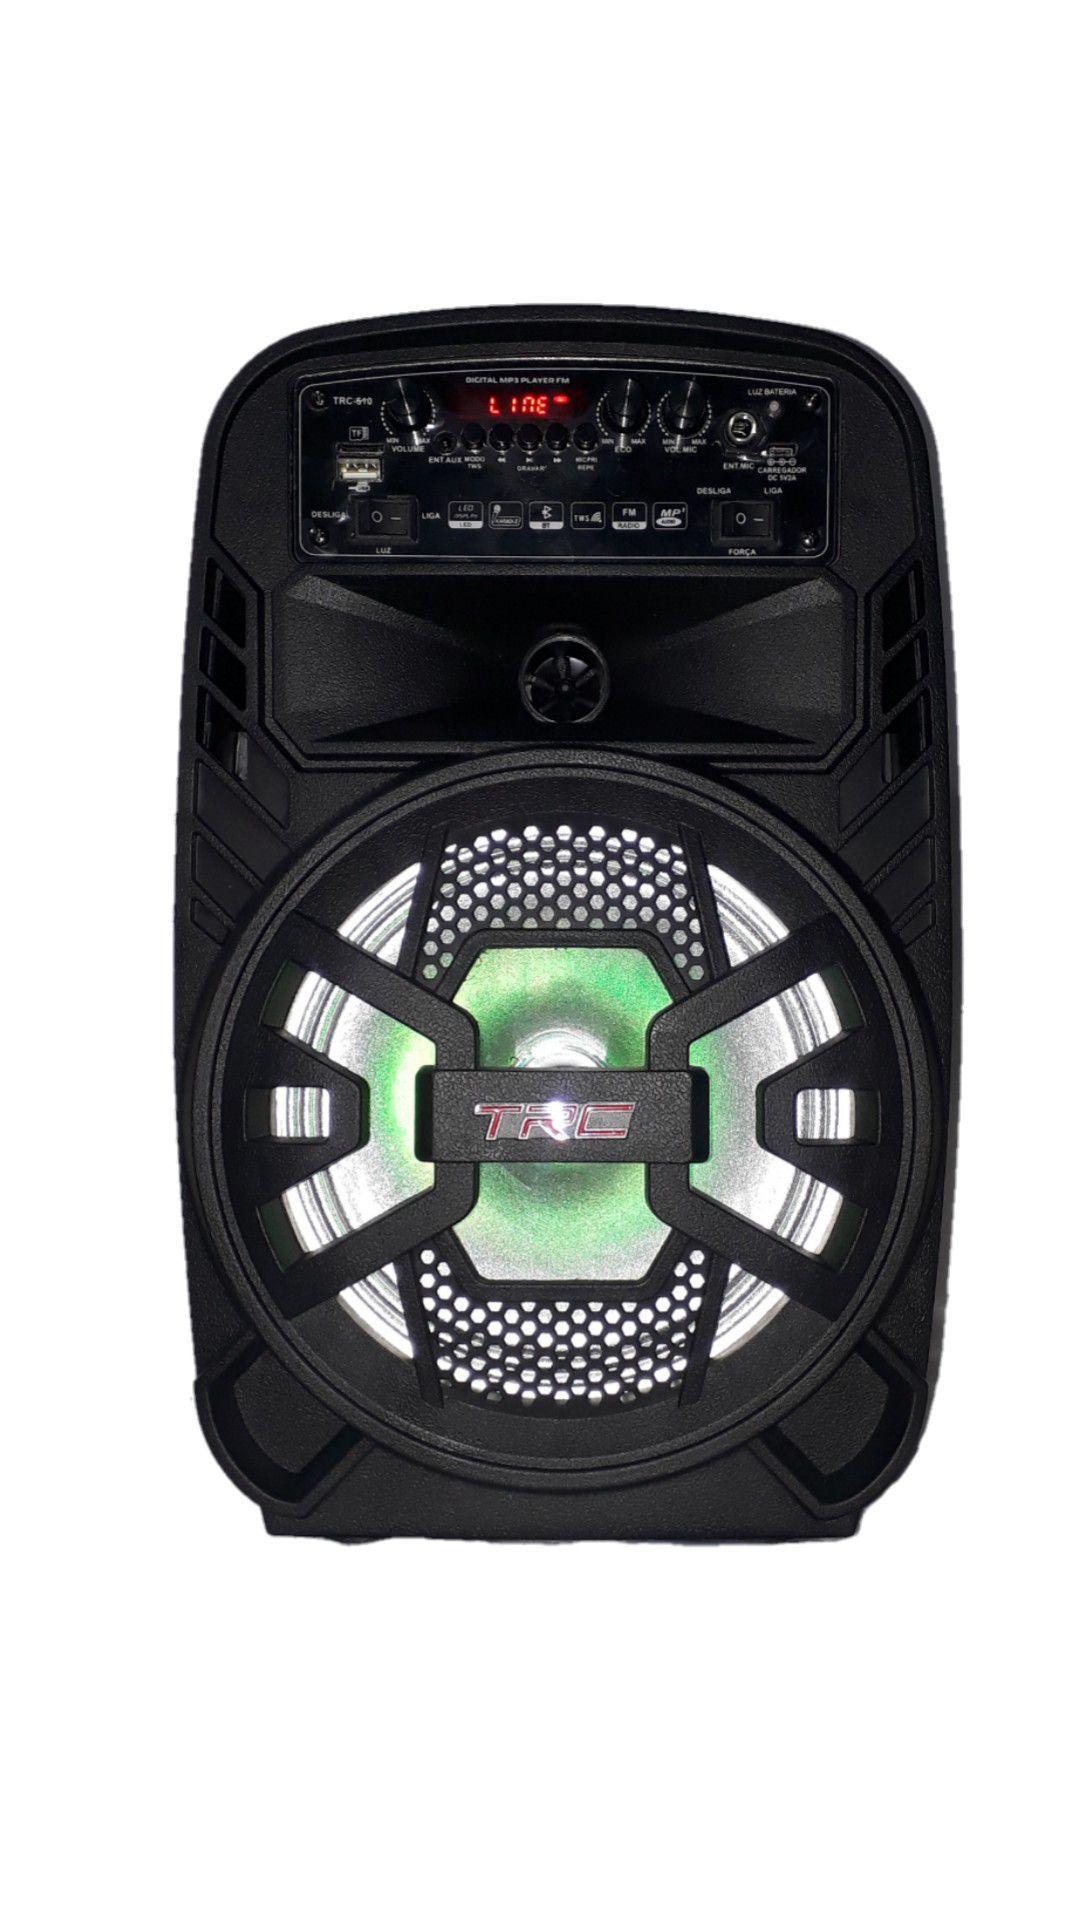 Caixa Amplificada Trc 510 Fal8 Usb/sd/blue/fm P10 1mic C/fio Control Bat 100w